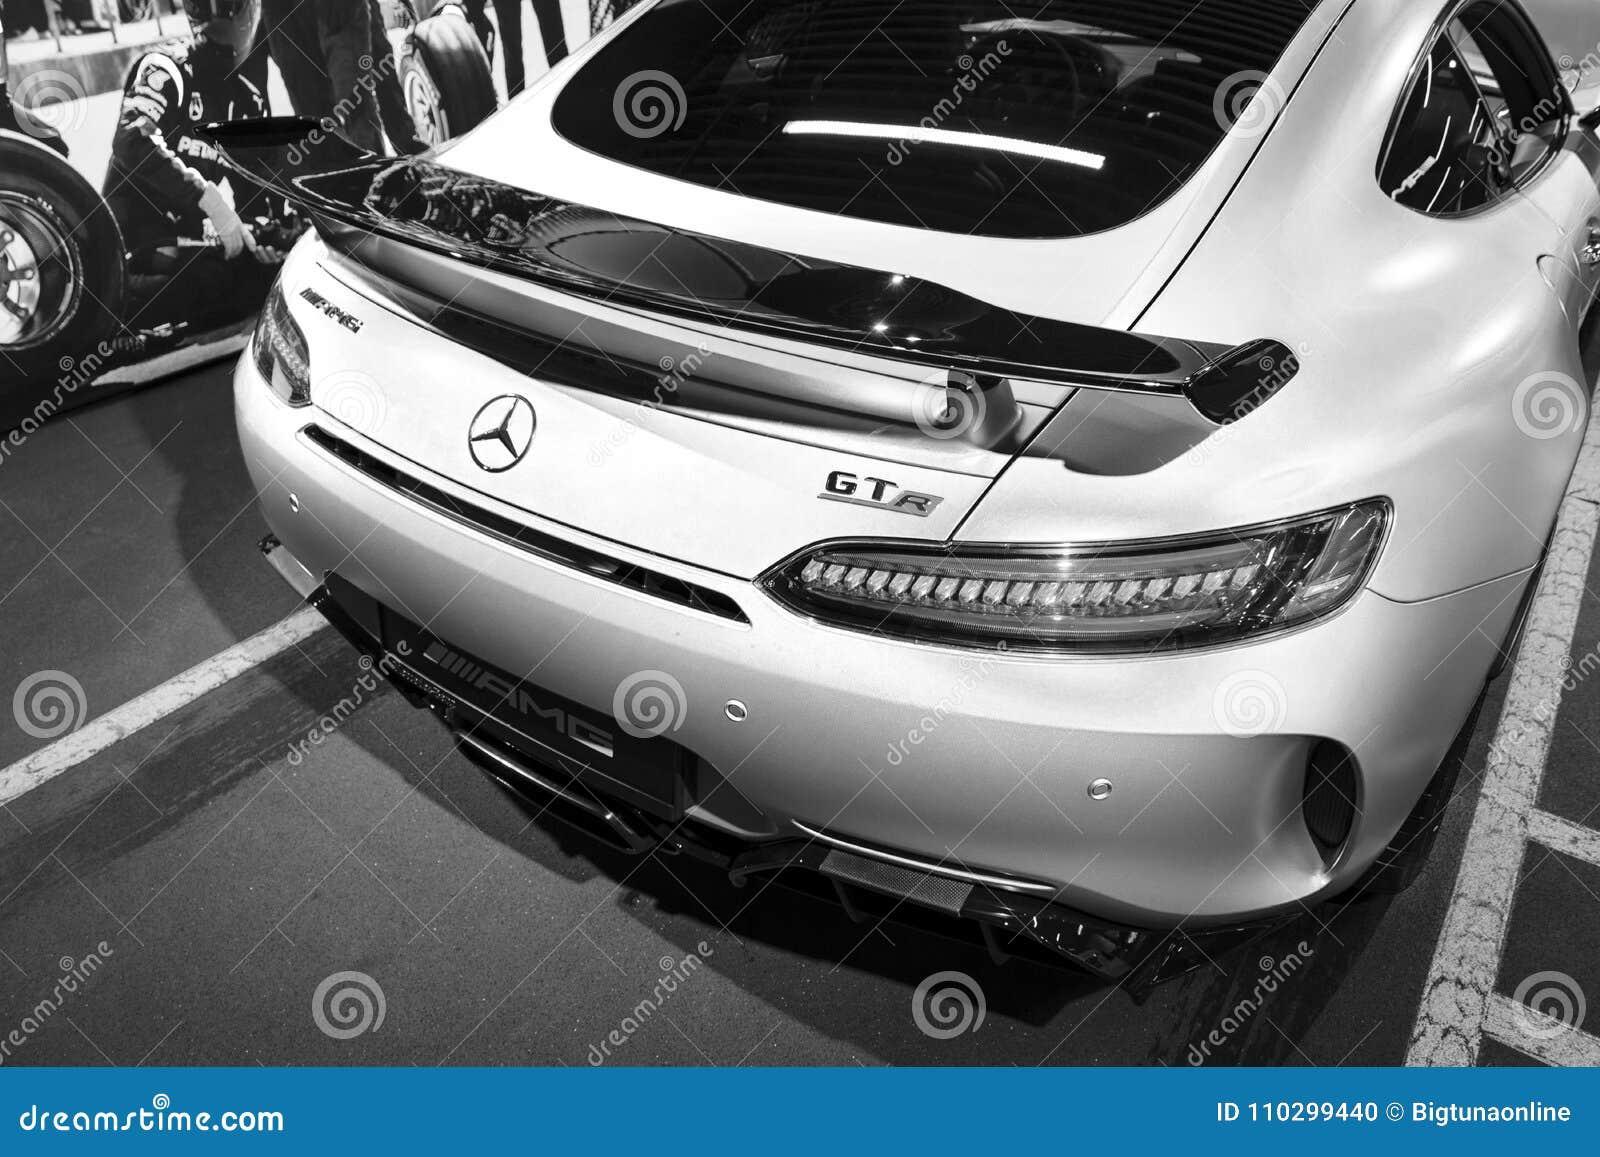 Mercedes Benz Amg Gtr 2018 V8 Bi Turbo Exterior Details Headlight